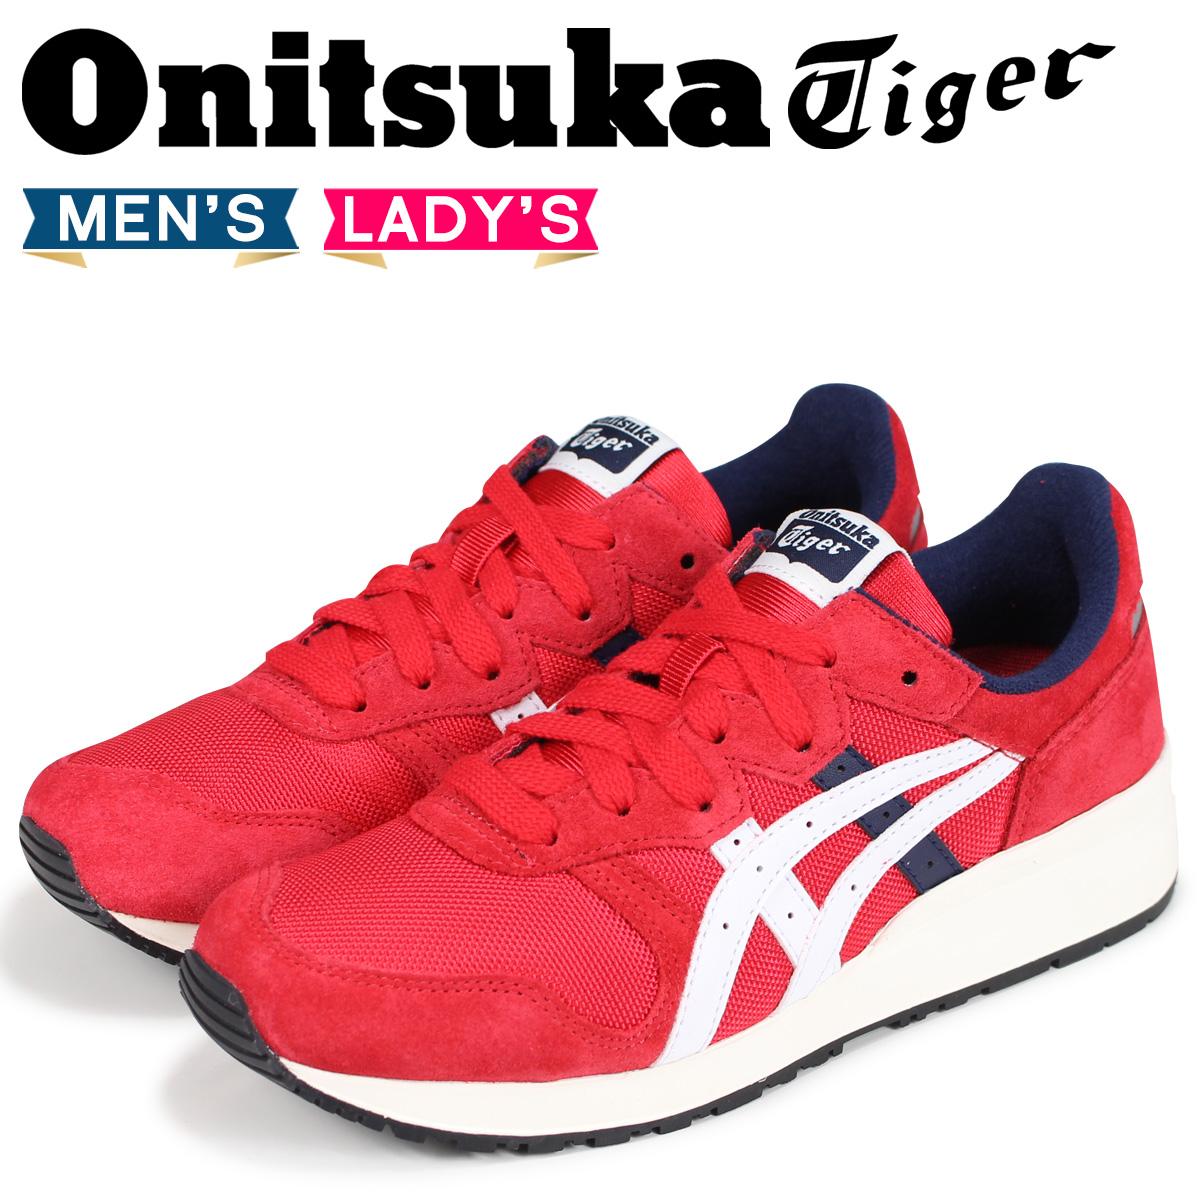 Onitsuka Tiger タイガー アリー オニツカタイガー TIGER ALLY メンズ レディース スニーカー 1183A029-600 レッド [予約商品 8/2頃入荷予定 新入荷]